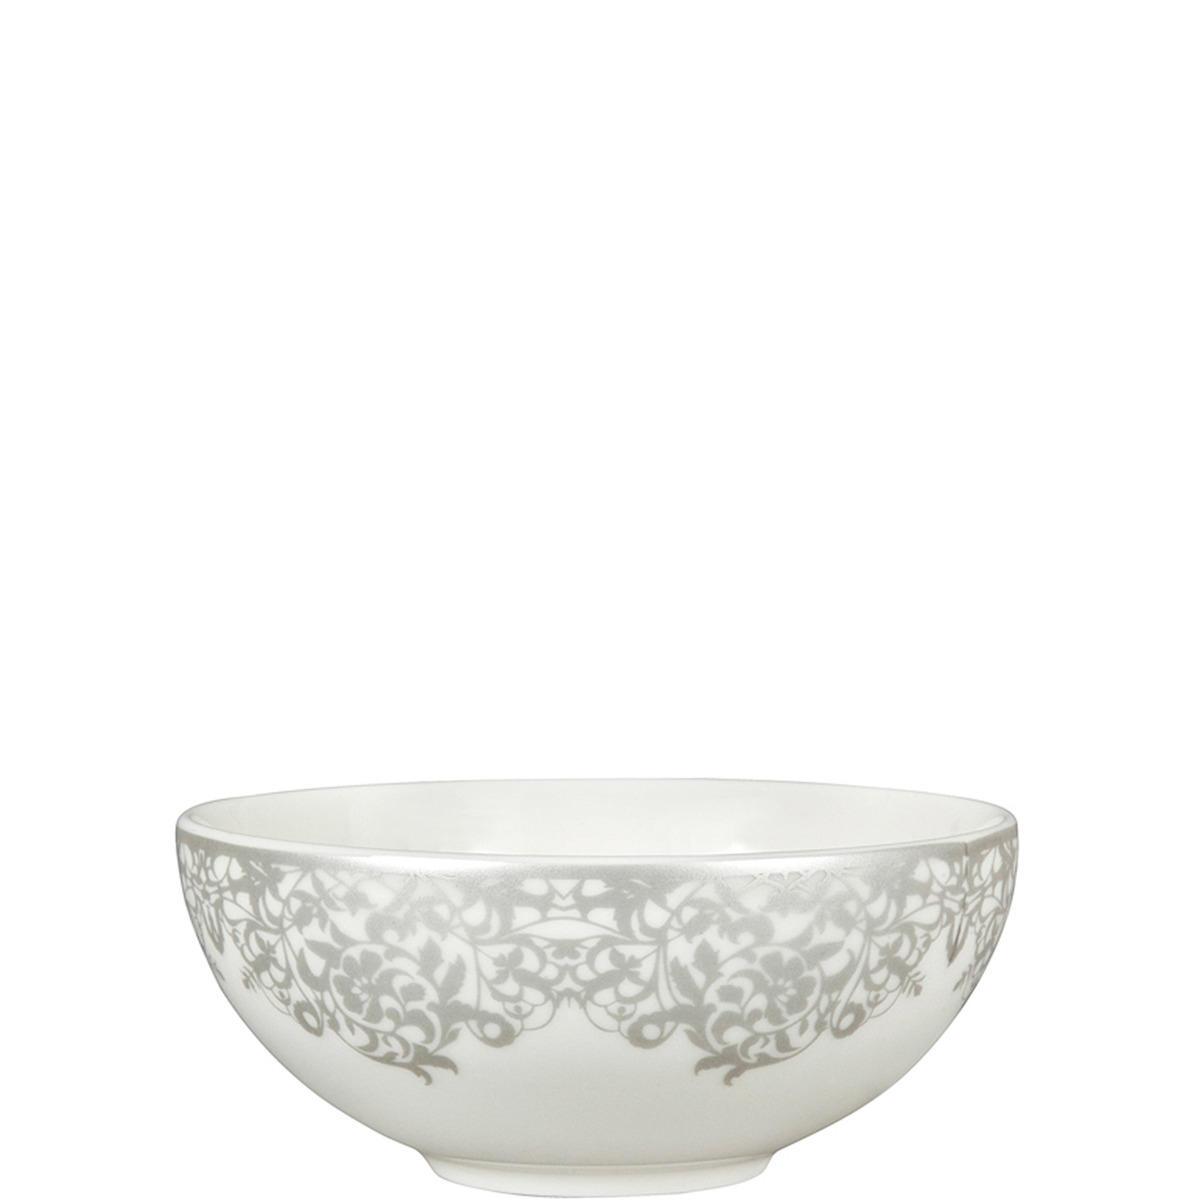 120709903: Monsoon Filigree Silver Dessert Bowl